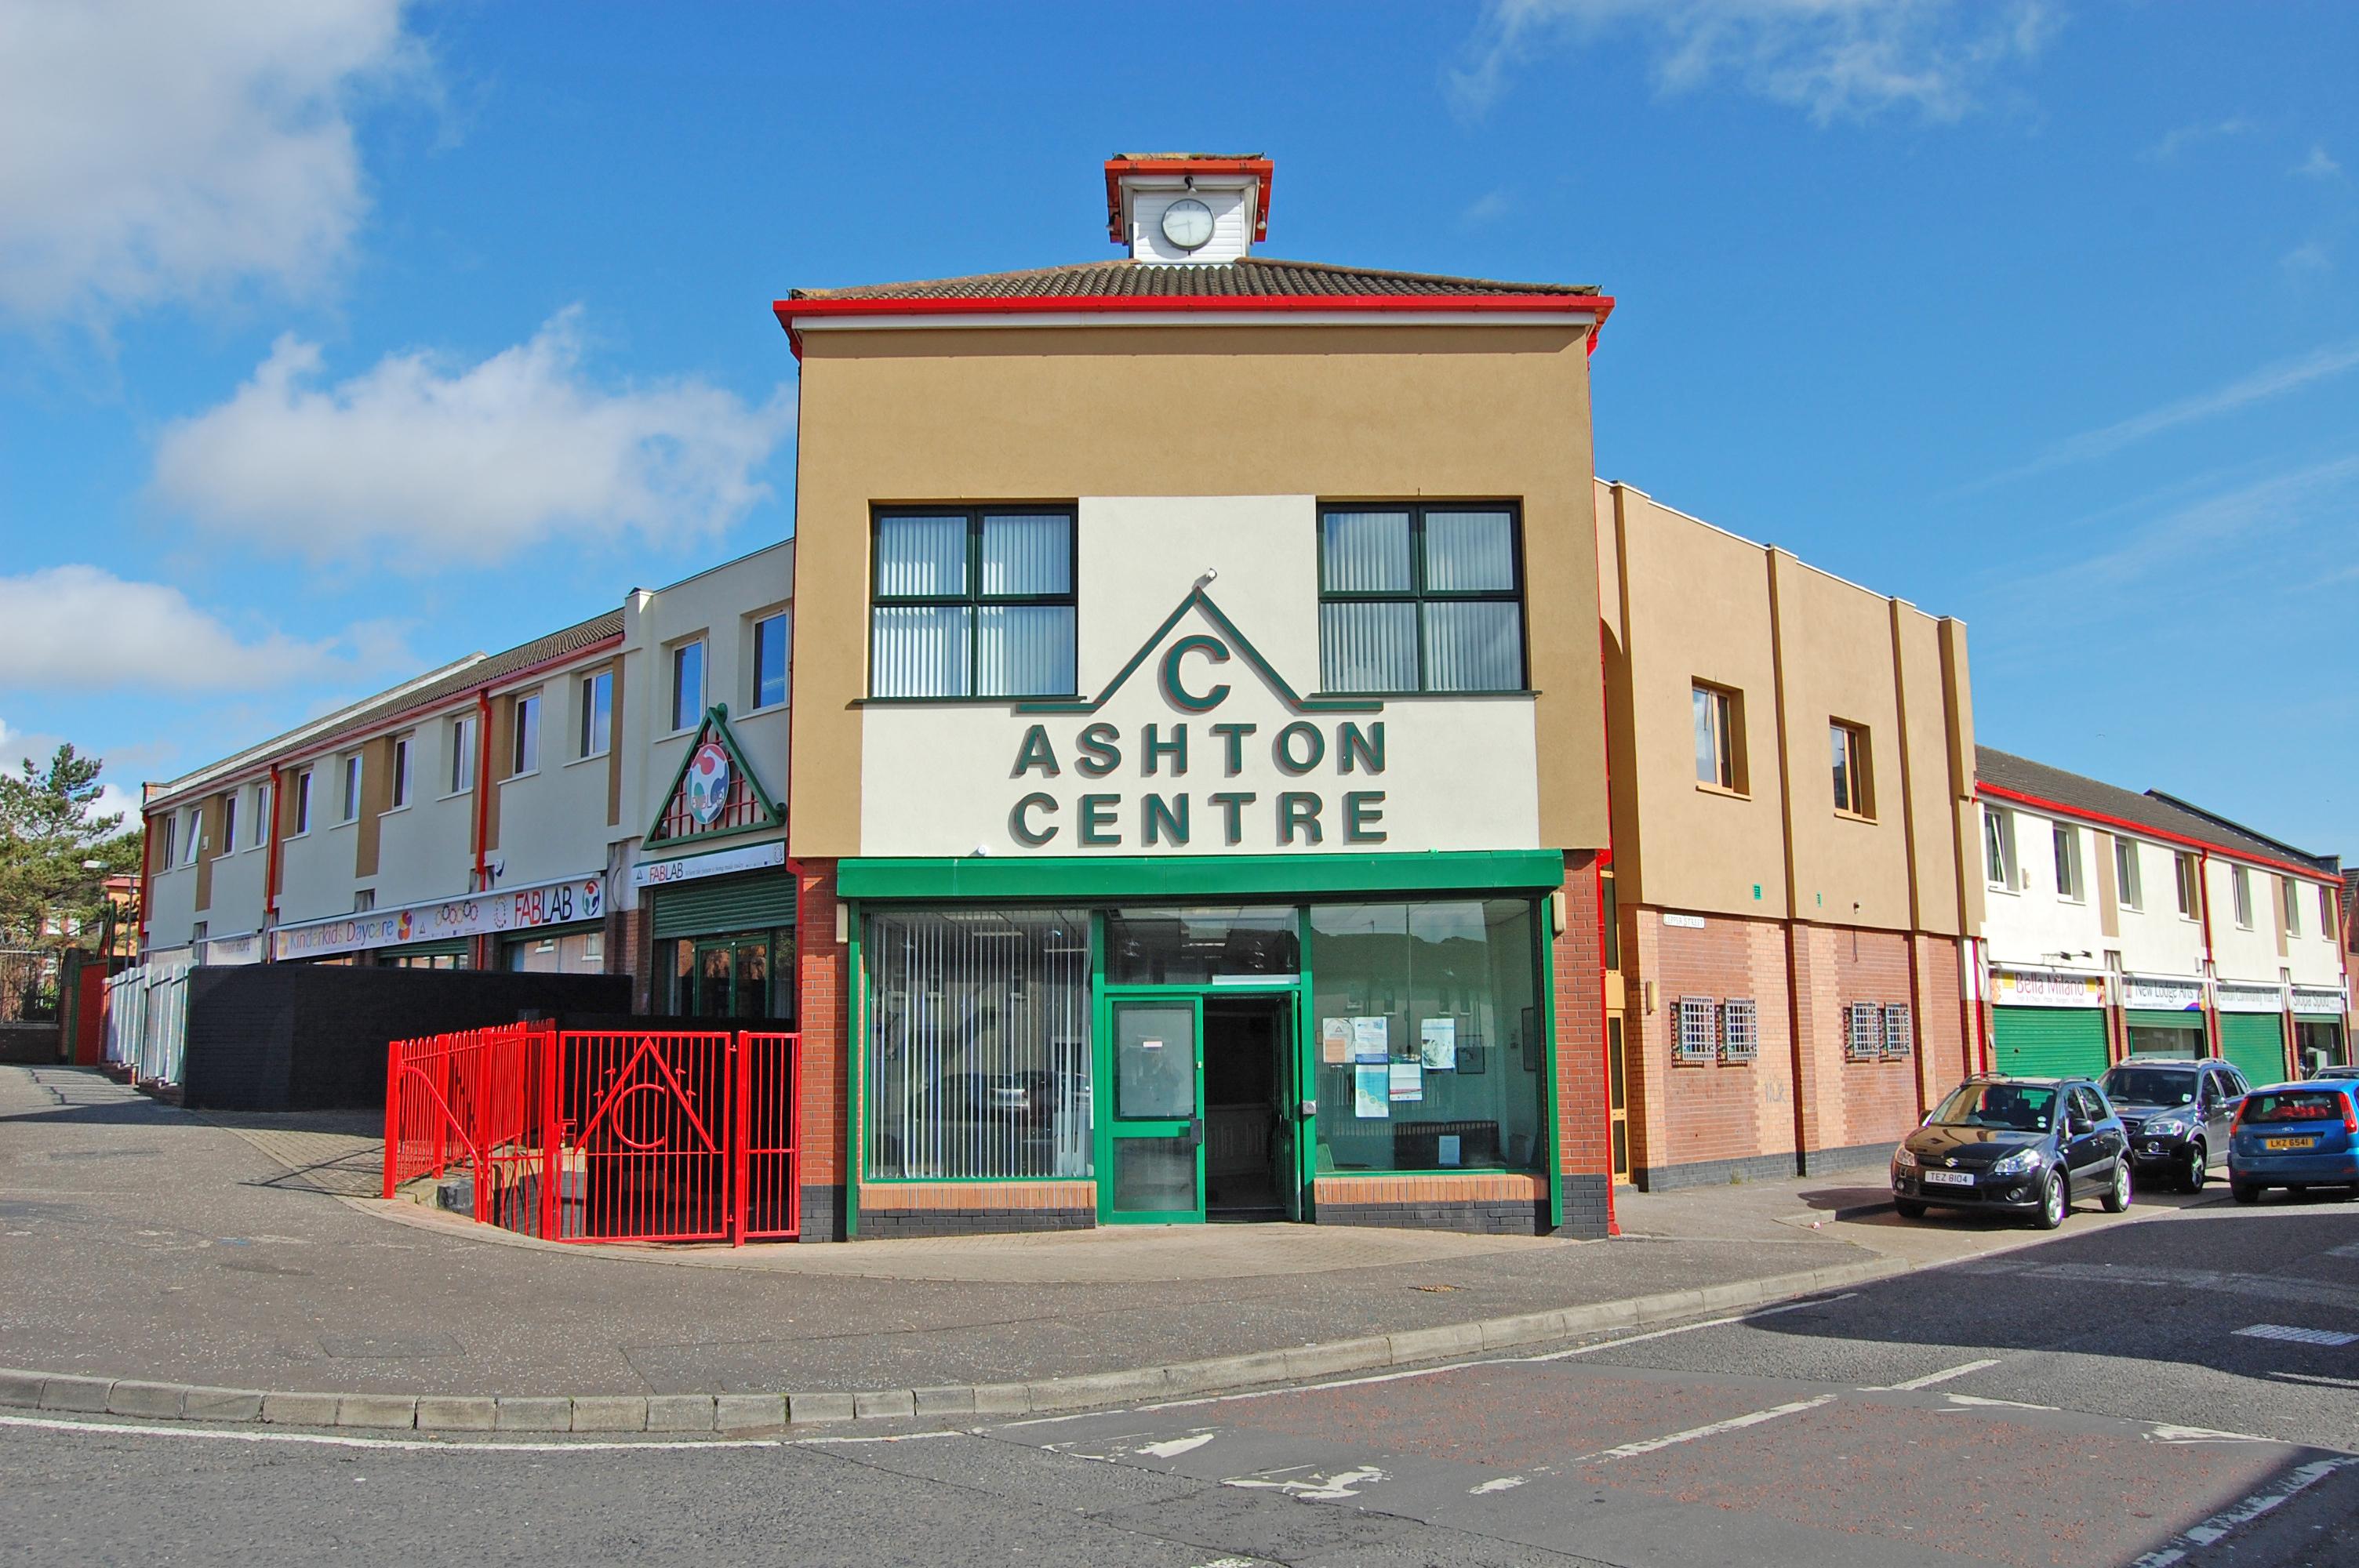 Ashton Centre